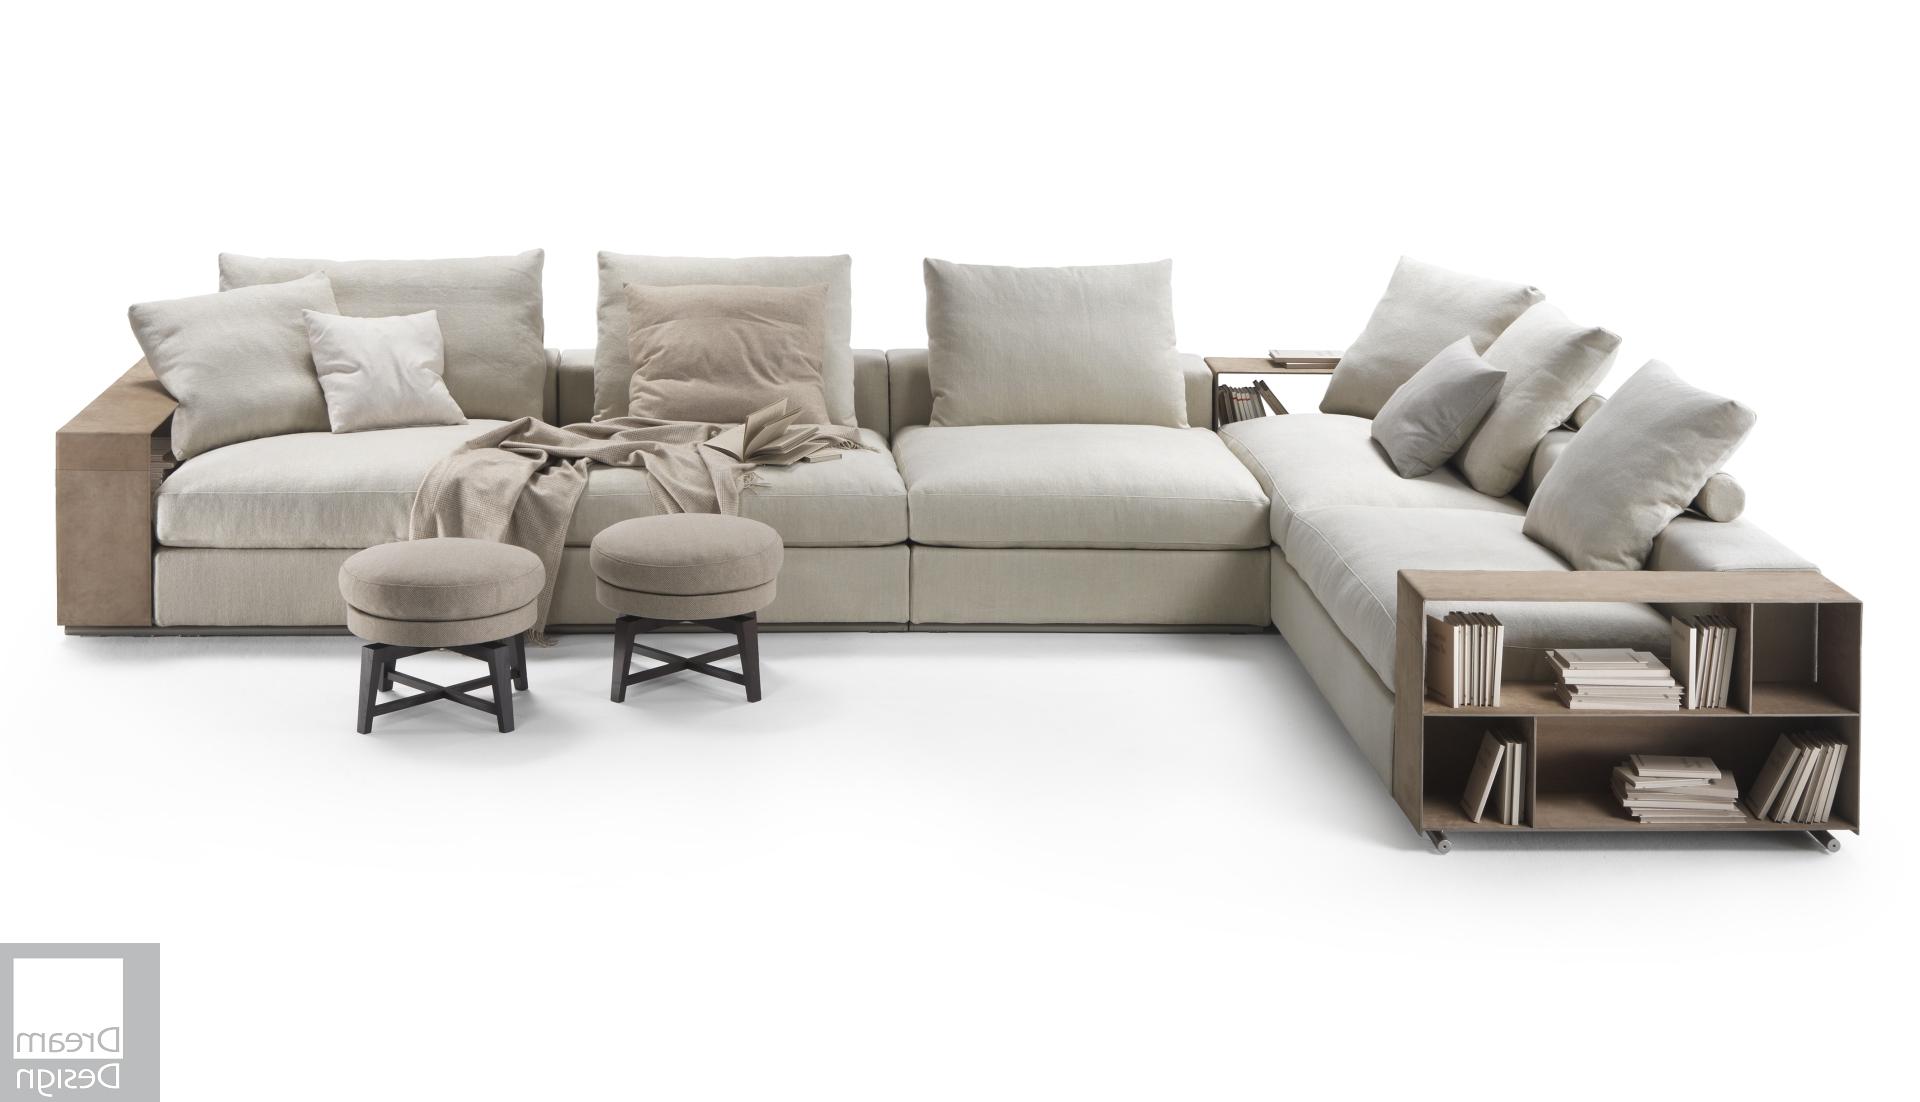 Favorite Dream Navy 2 Piece Modular Sofas With Flexform Groundpiece Modular Sofa – Dream Design Interiors Ltd (View 2 of 20)